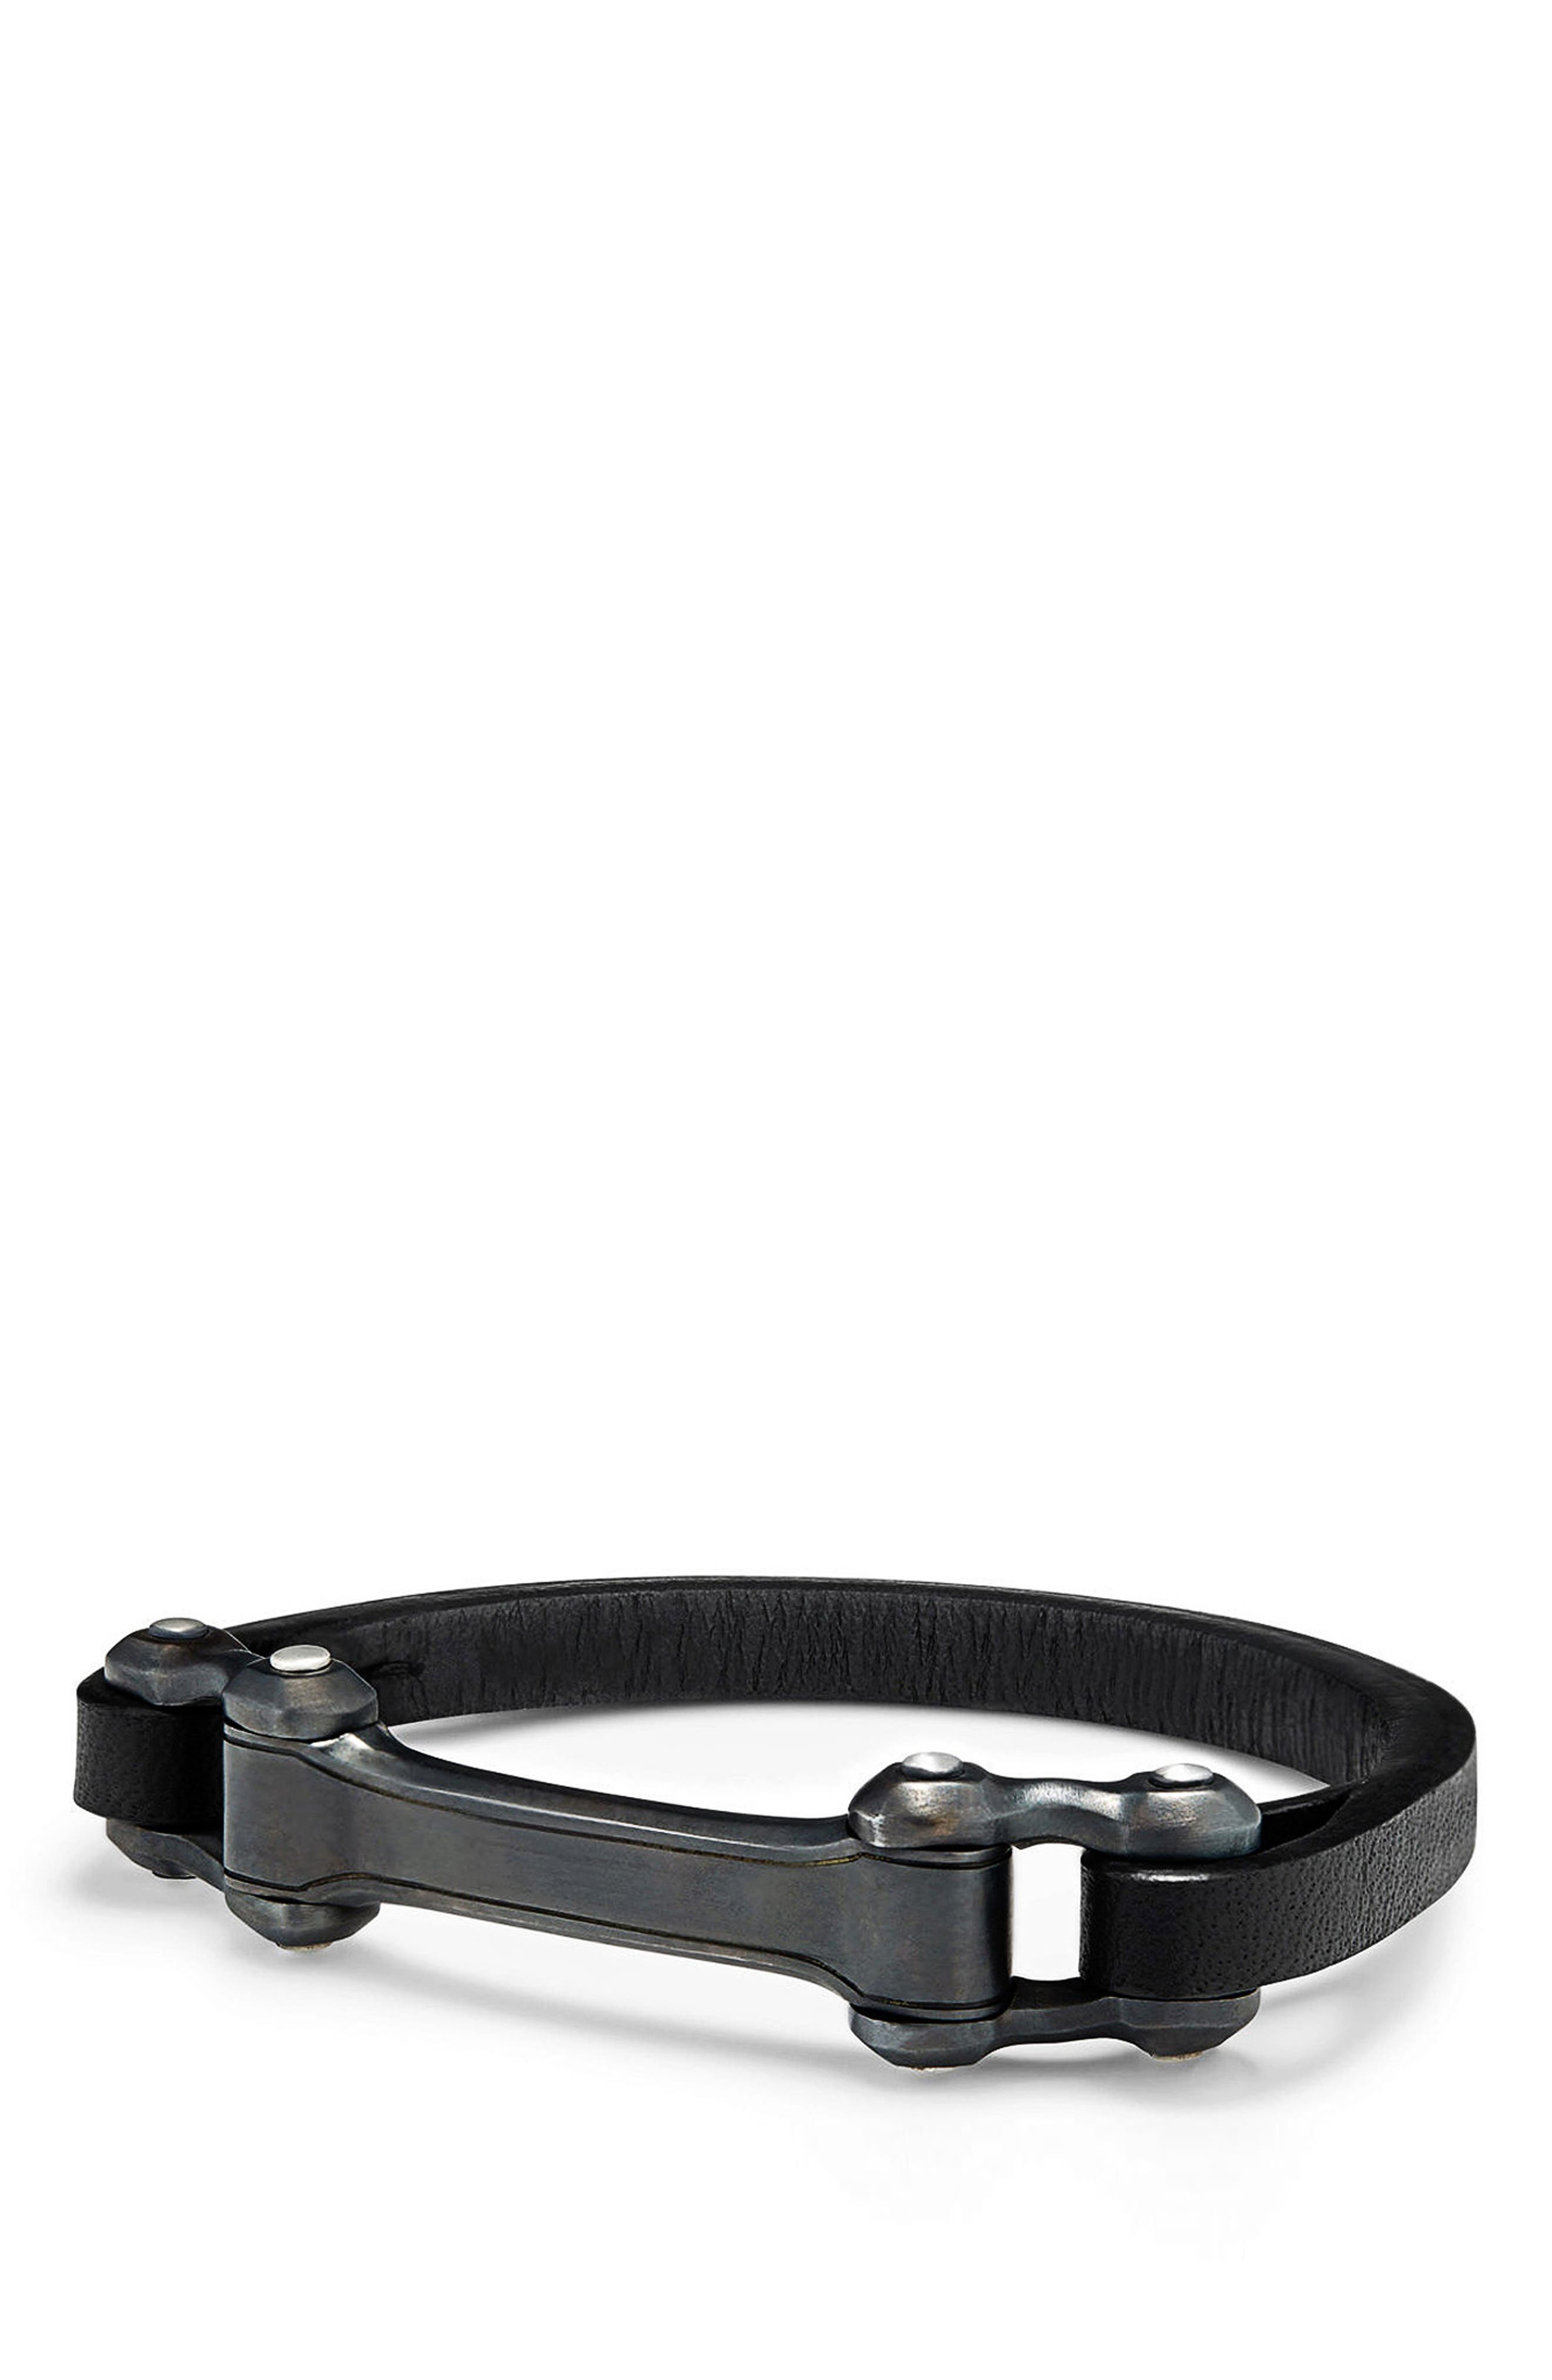 Anvil ID Bracelet,                             Main thumbnail 1, color,                             SILVER/ STEEL/ BLACK LEATHER